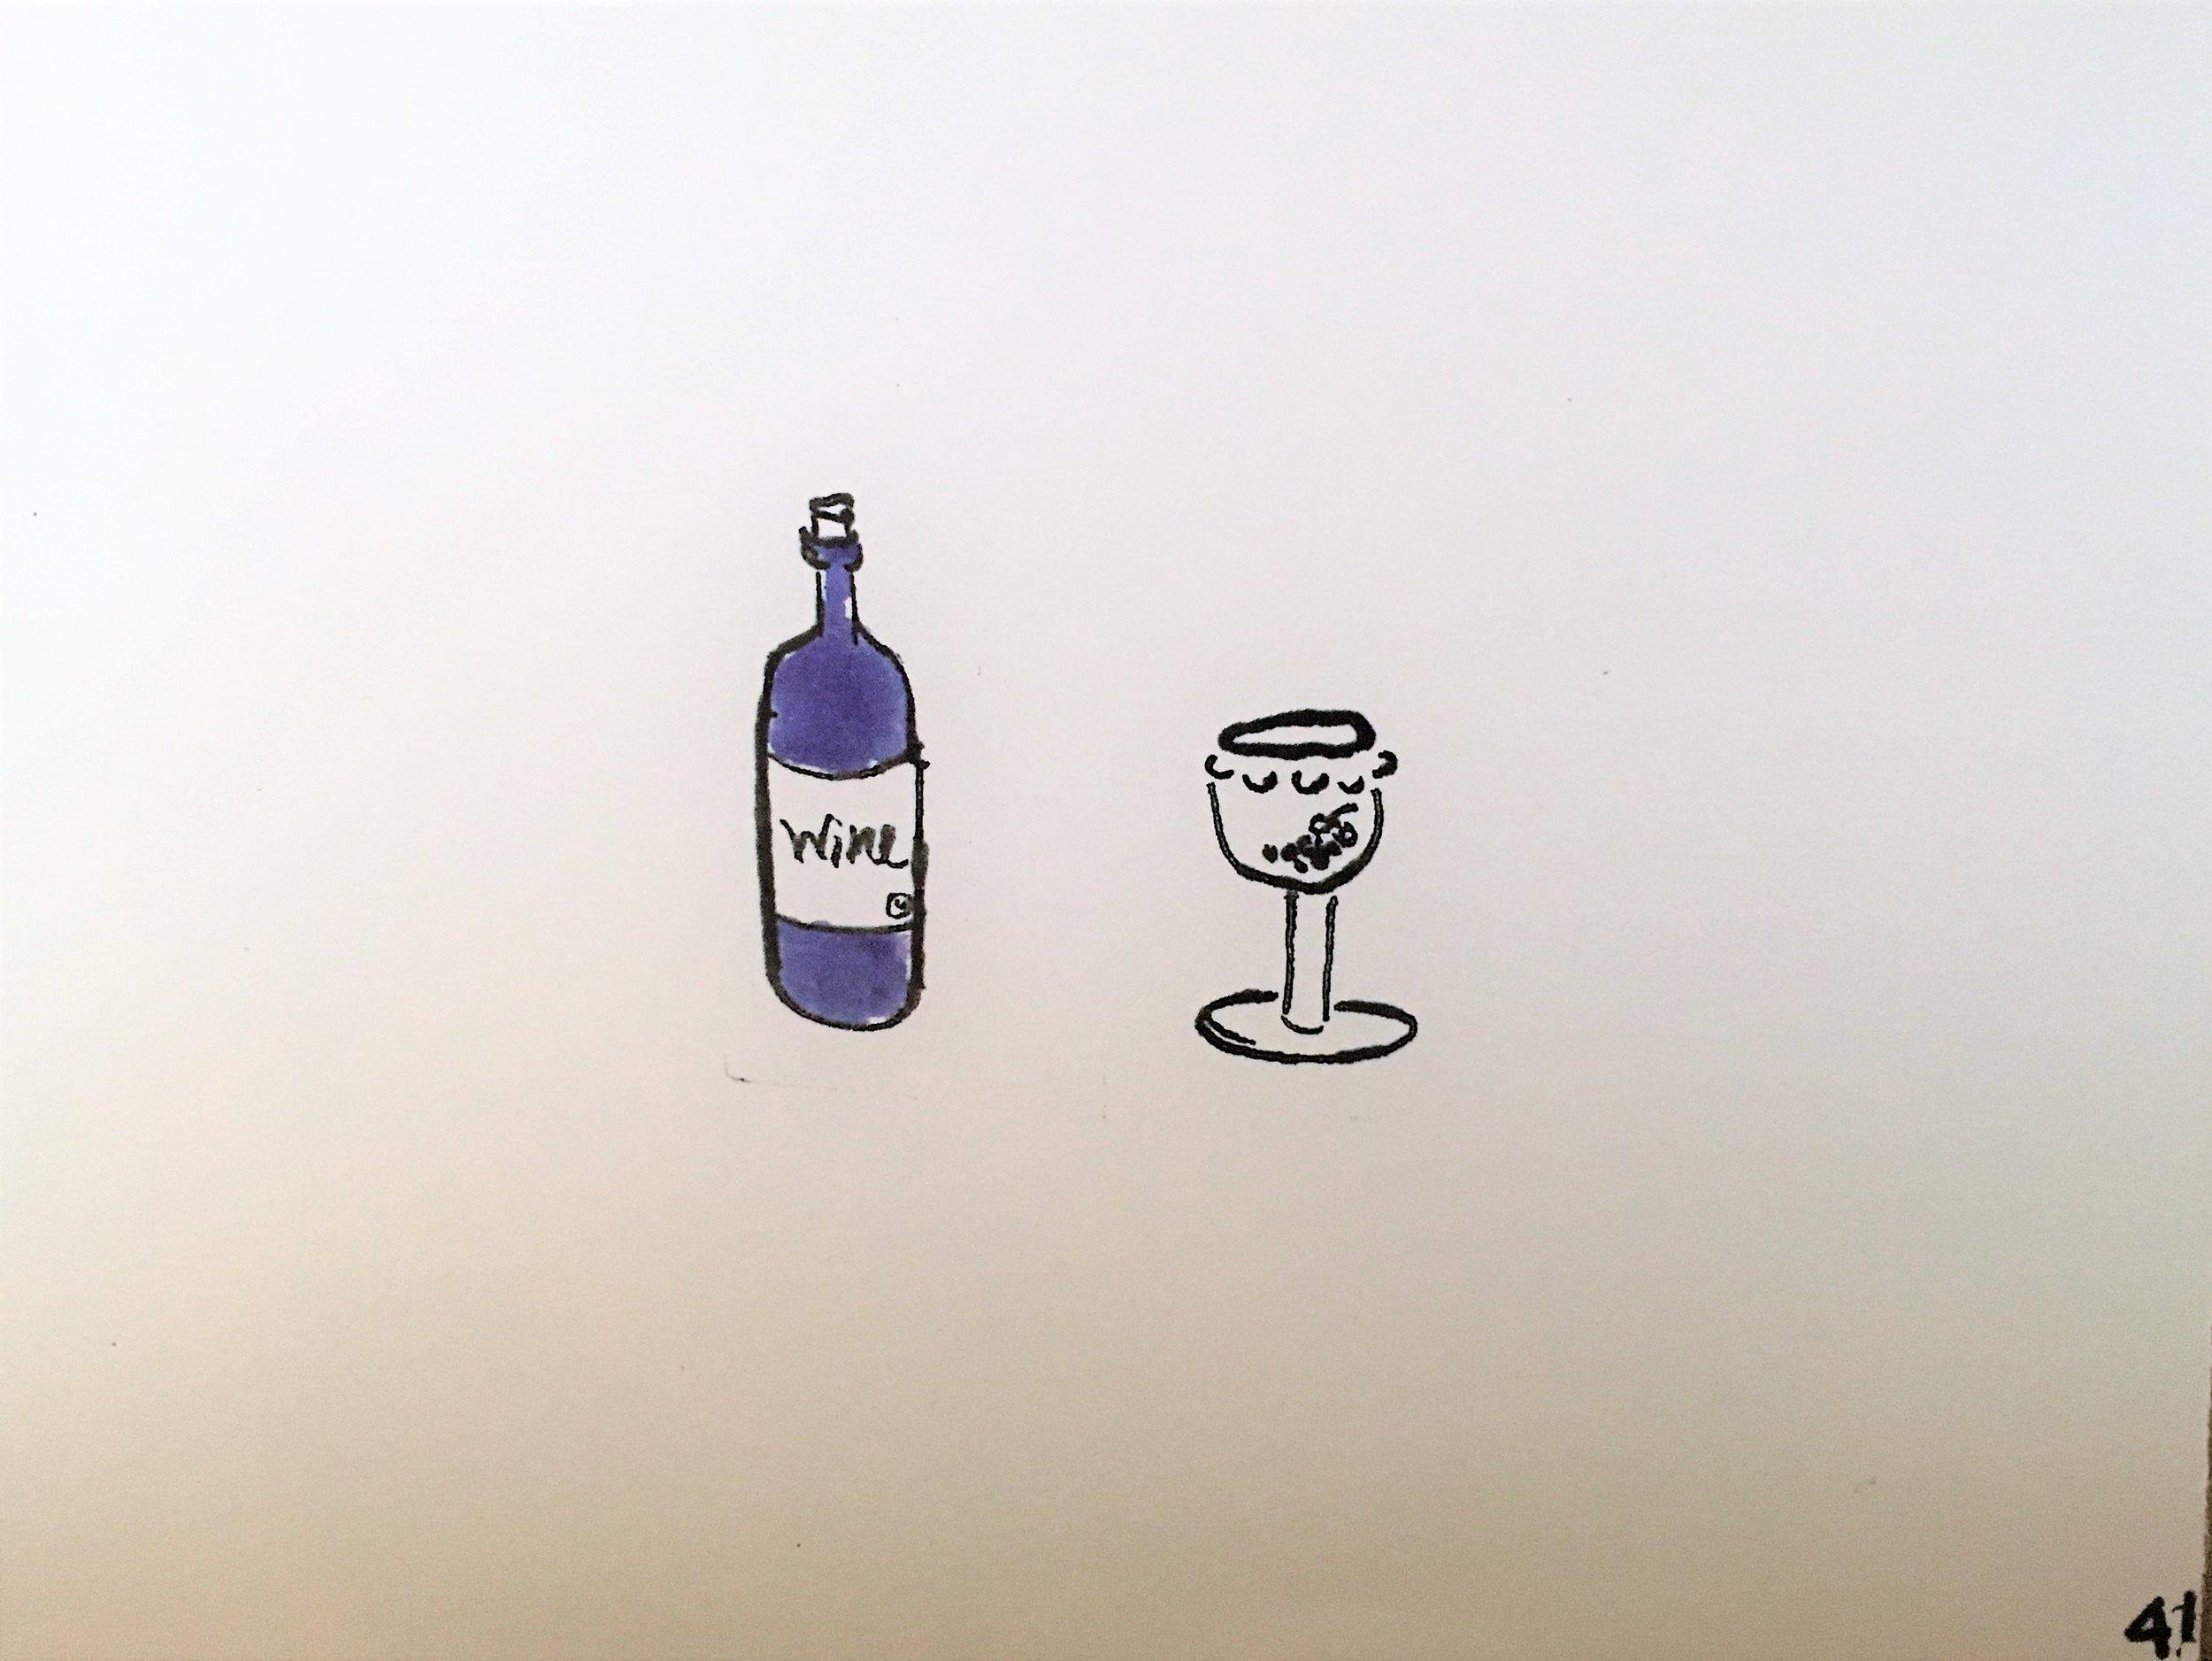 Wine, closing image